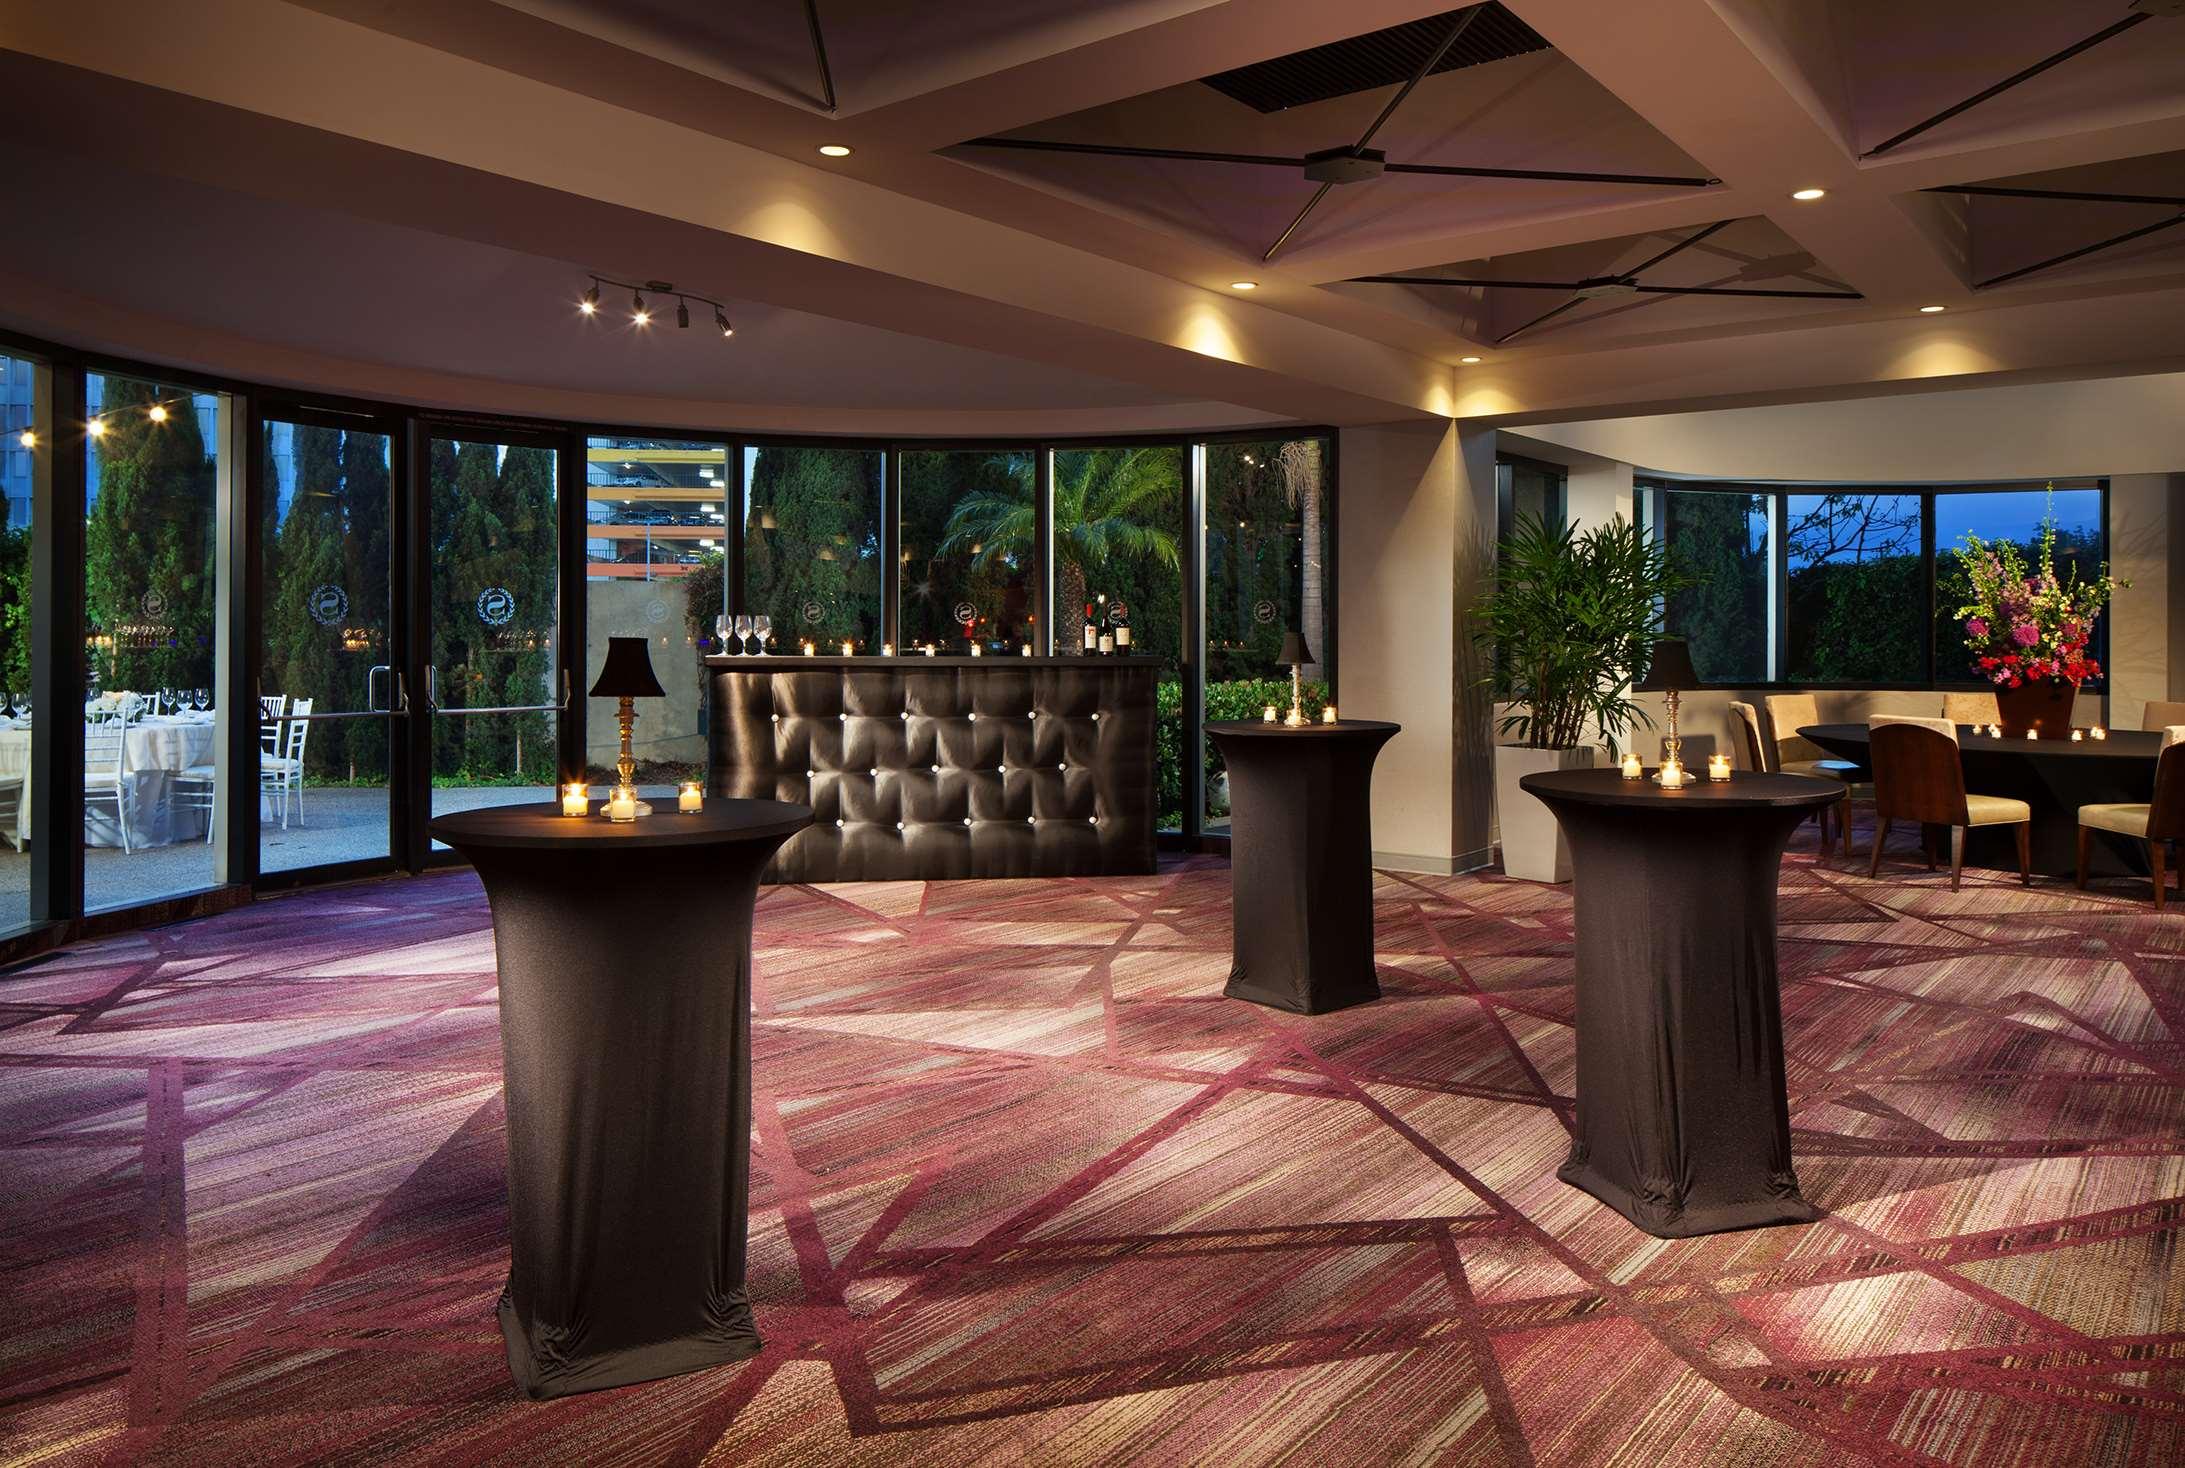 Sheraton Gateway Los Angeles Hotel image 34